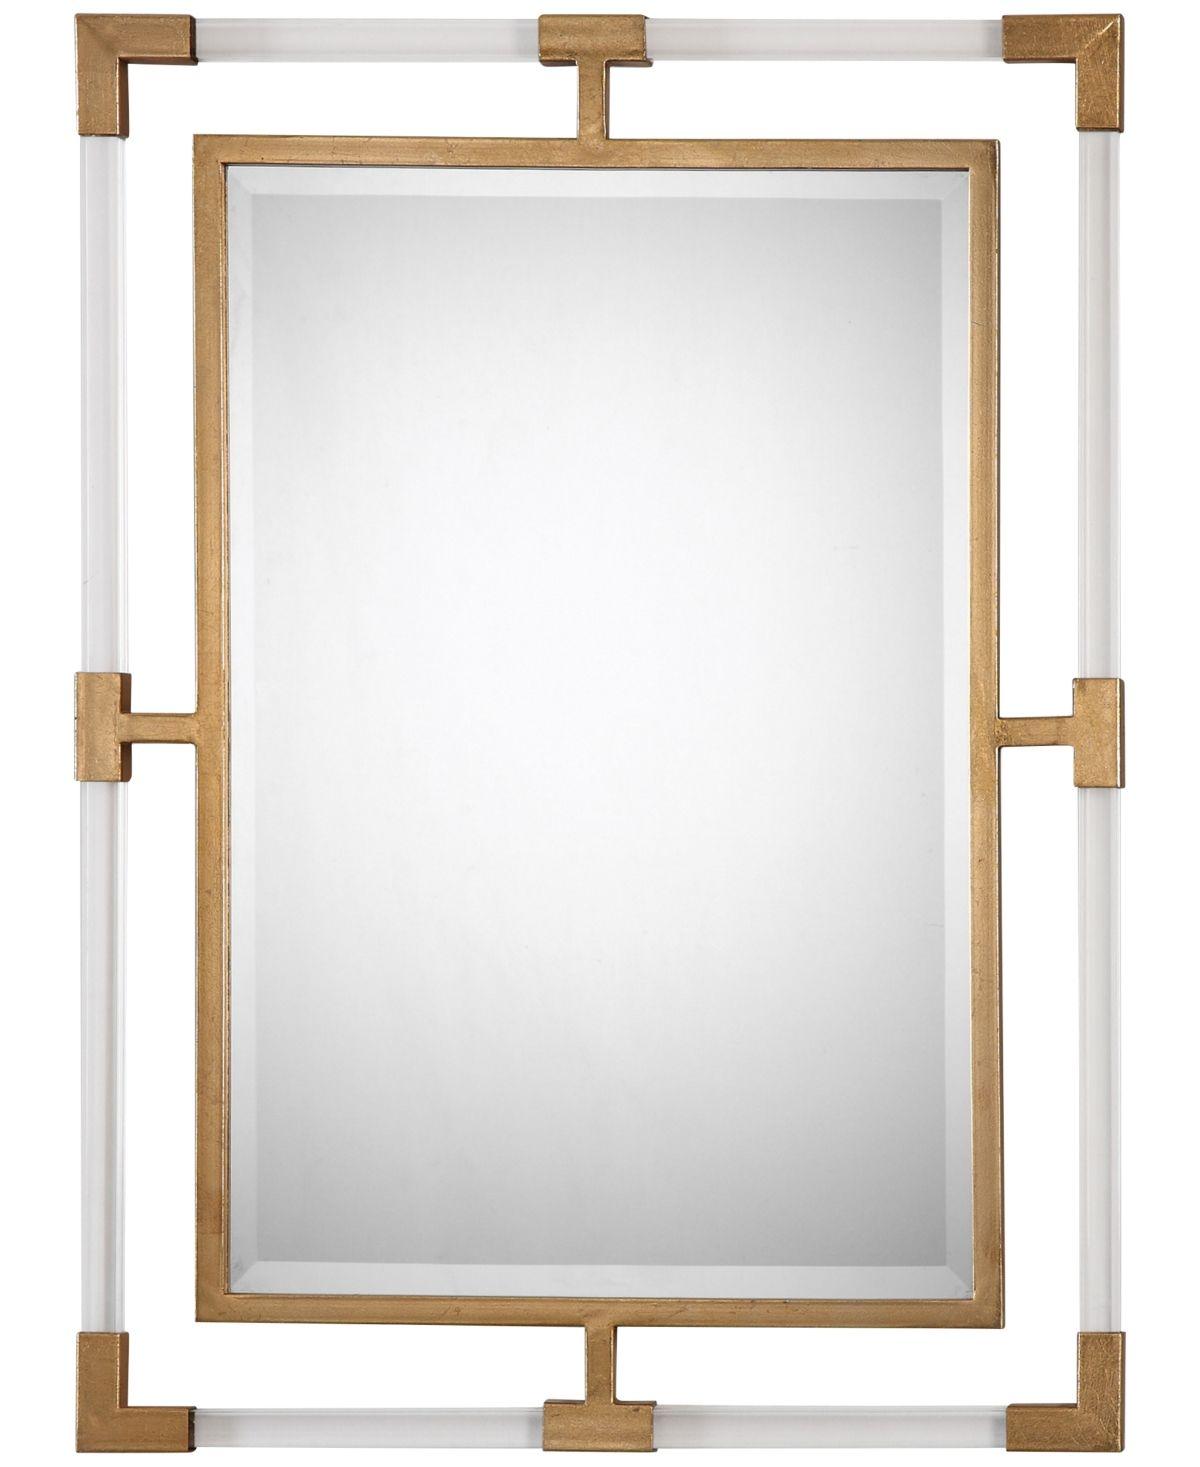 Uttermost Balkan Mirror Reviews All Mirrors Home Decor